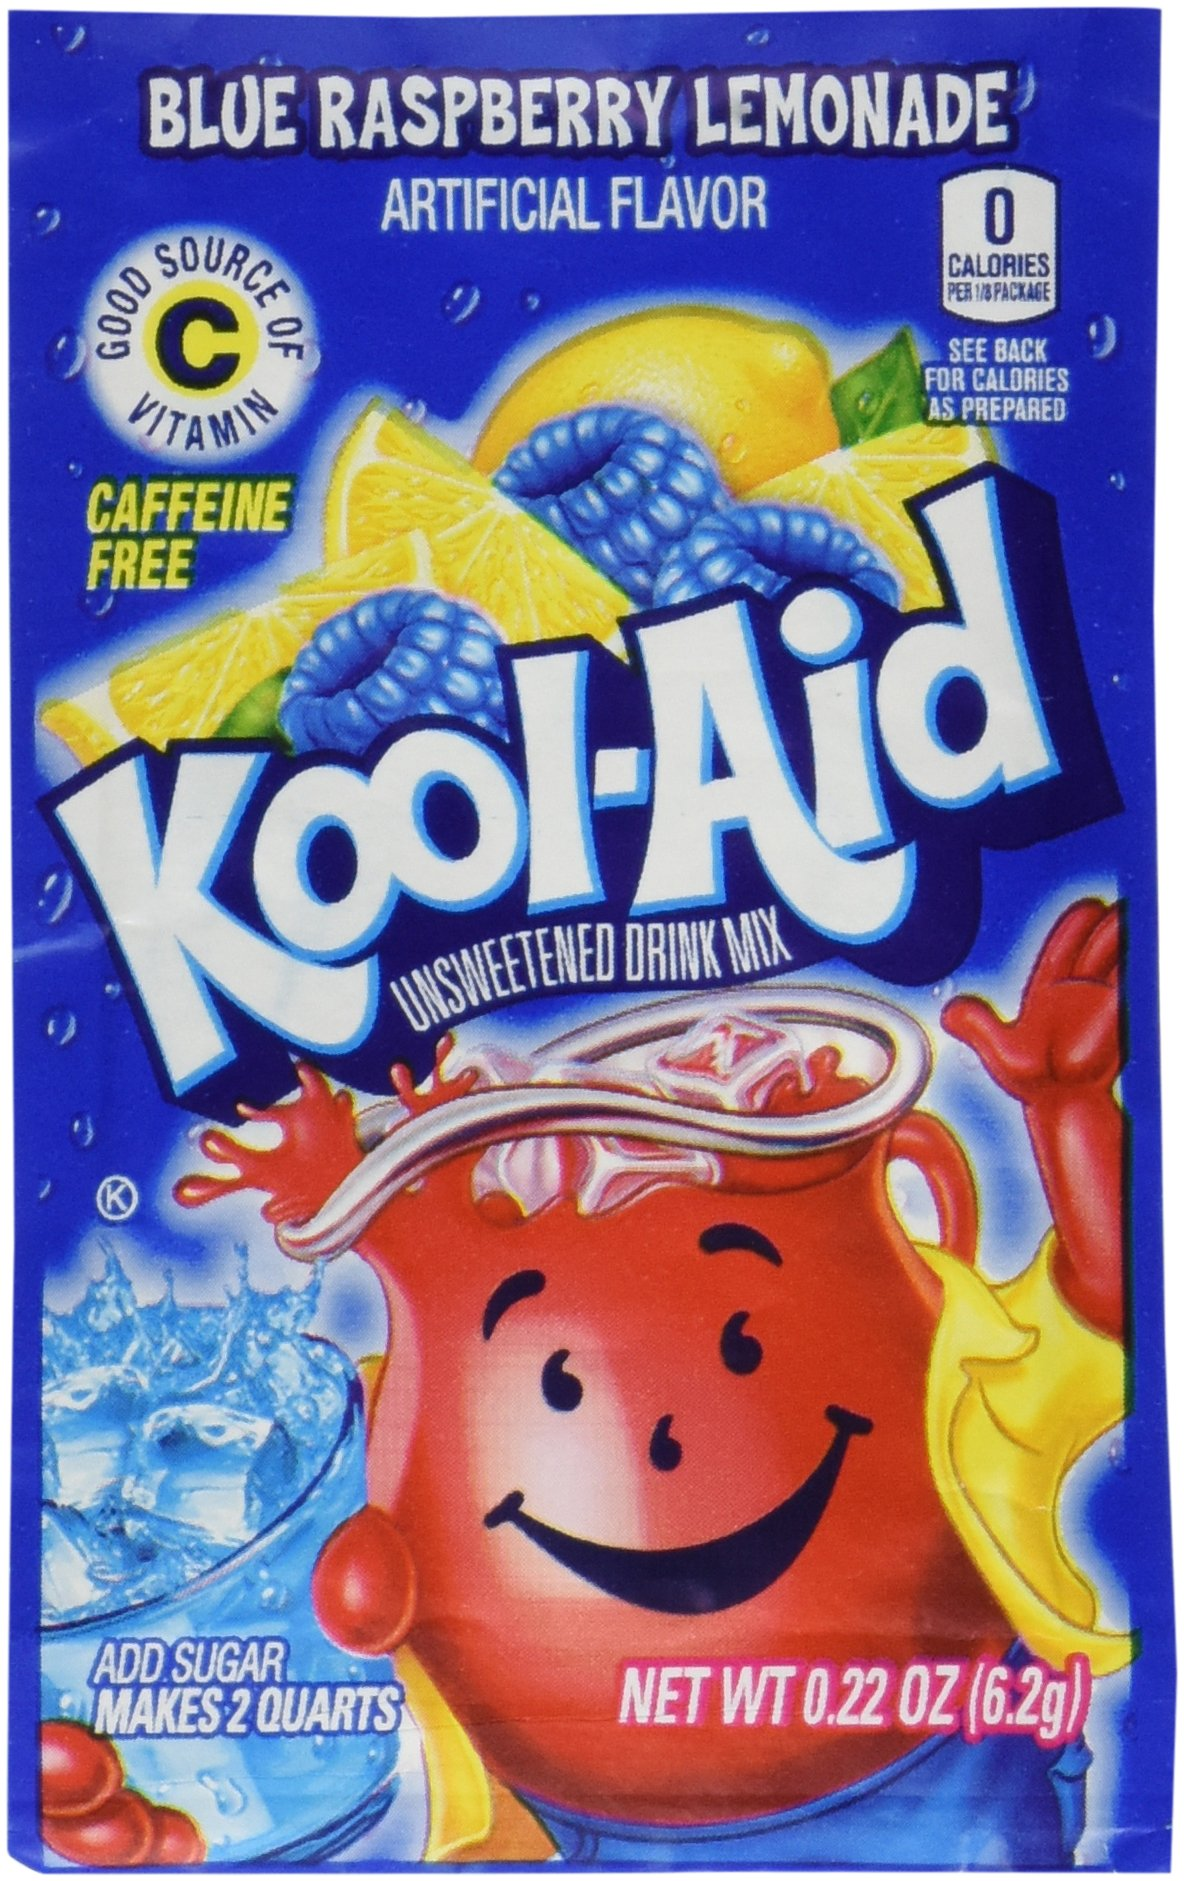 Kool-Aid Twists Soft Drink Mix - Ice Blue Raspberry Lemonade Unsweetened, Caffeine Free, 0.22 oz/envelope (Pack of 12)